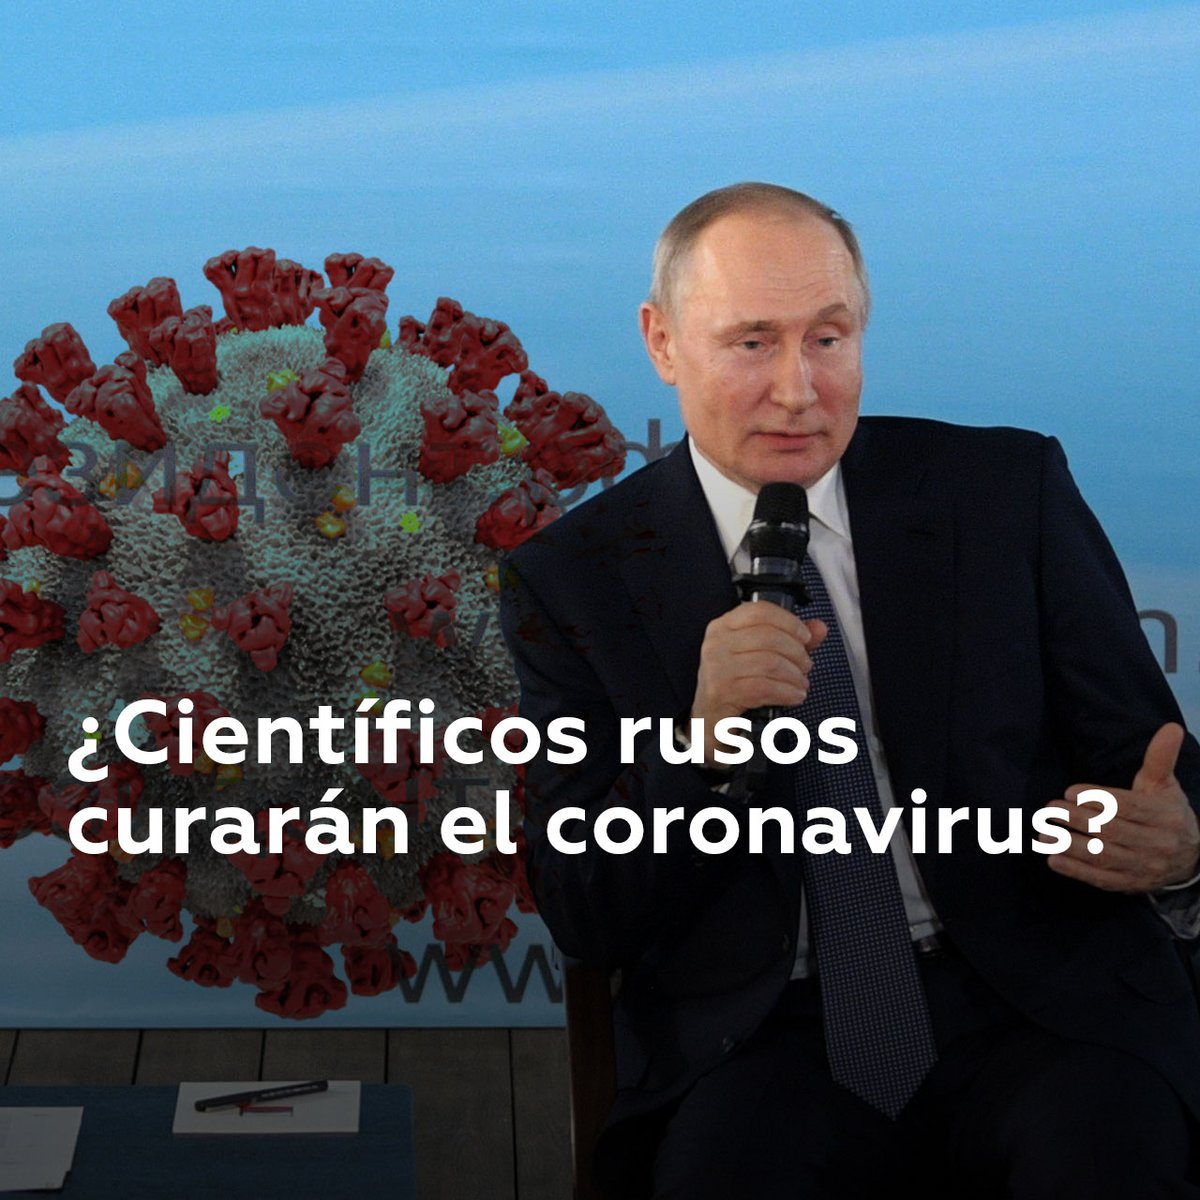 @ActualidadRT's photo on Putin